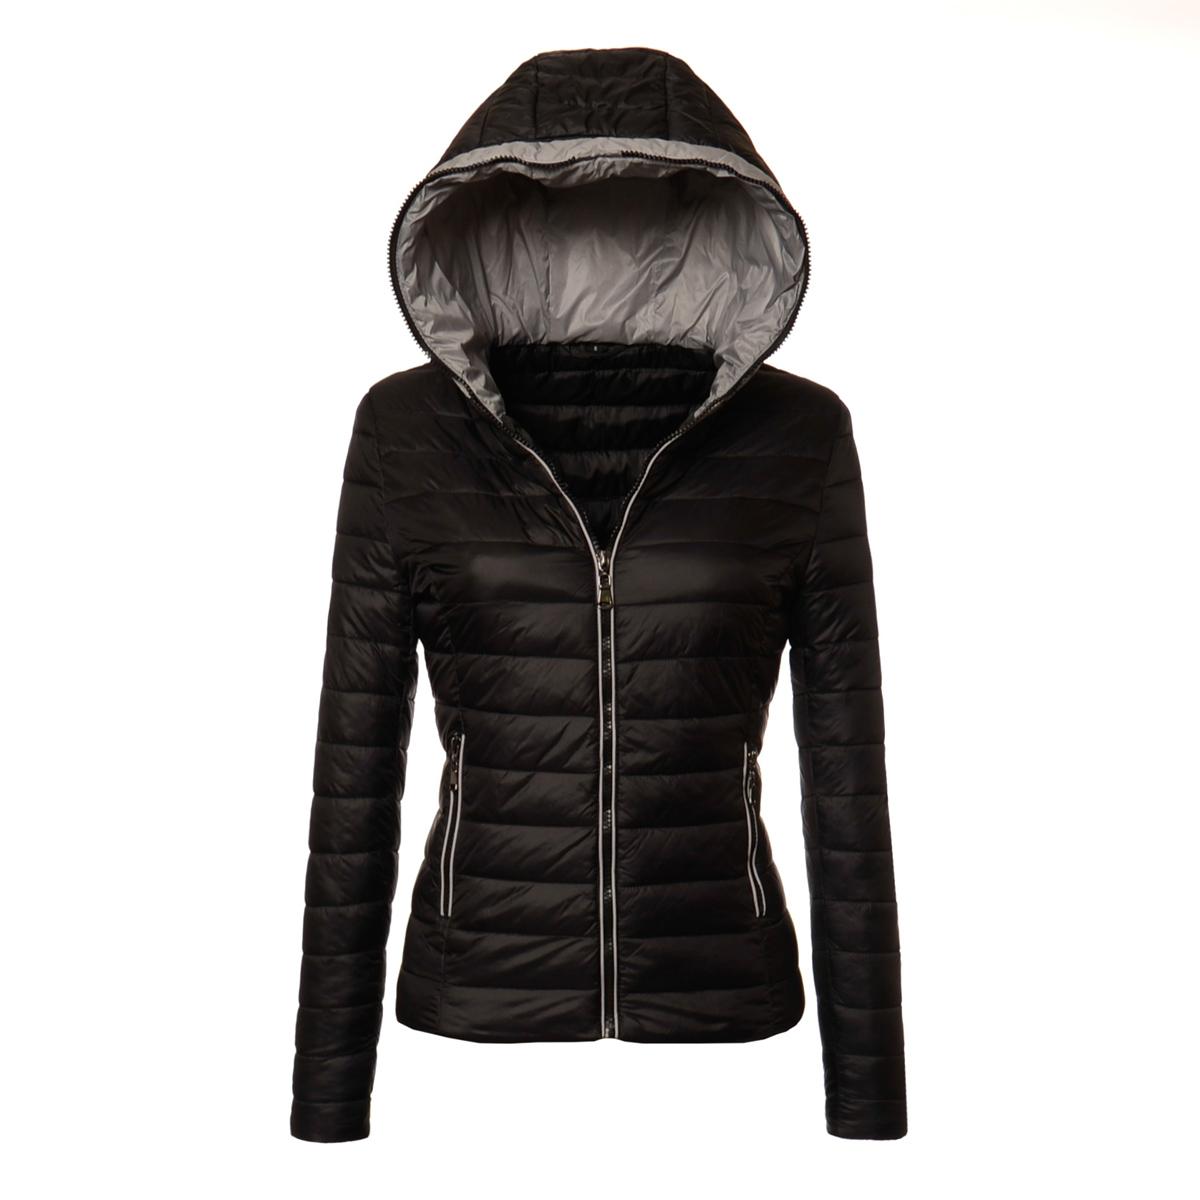 kurtka wiosenna pikowana męska czarna